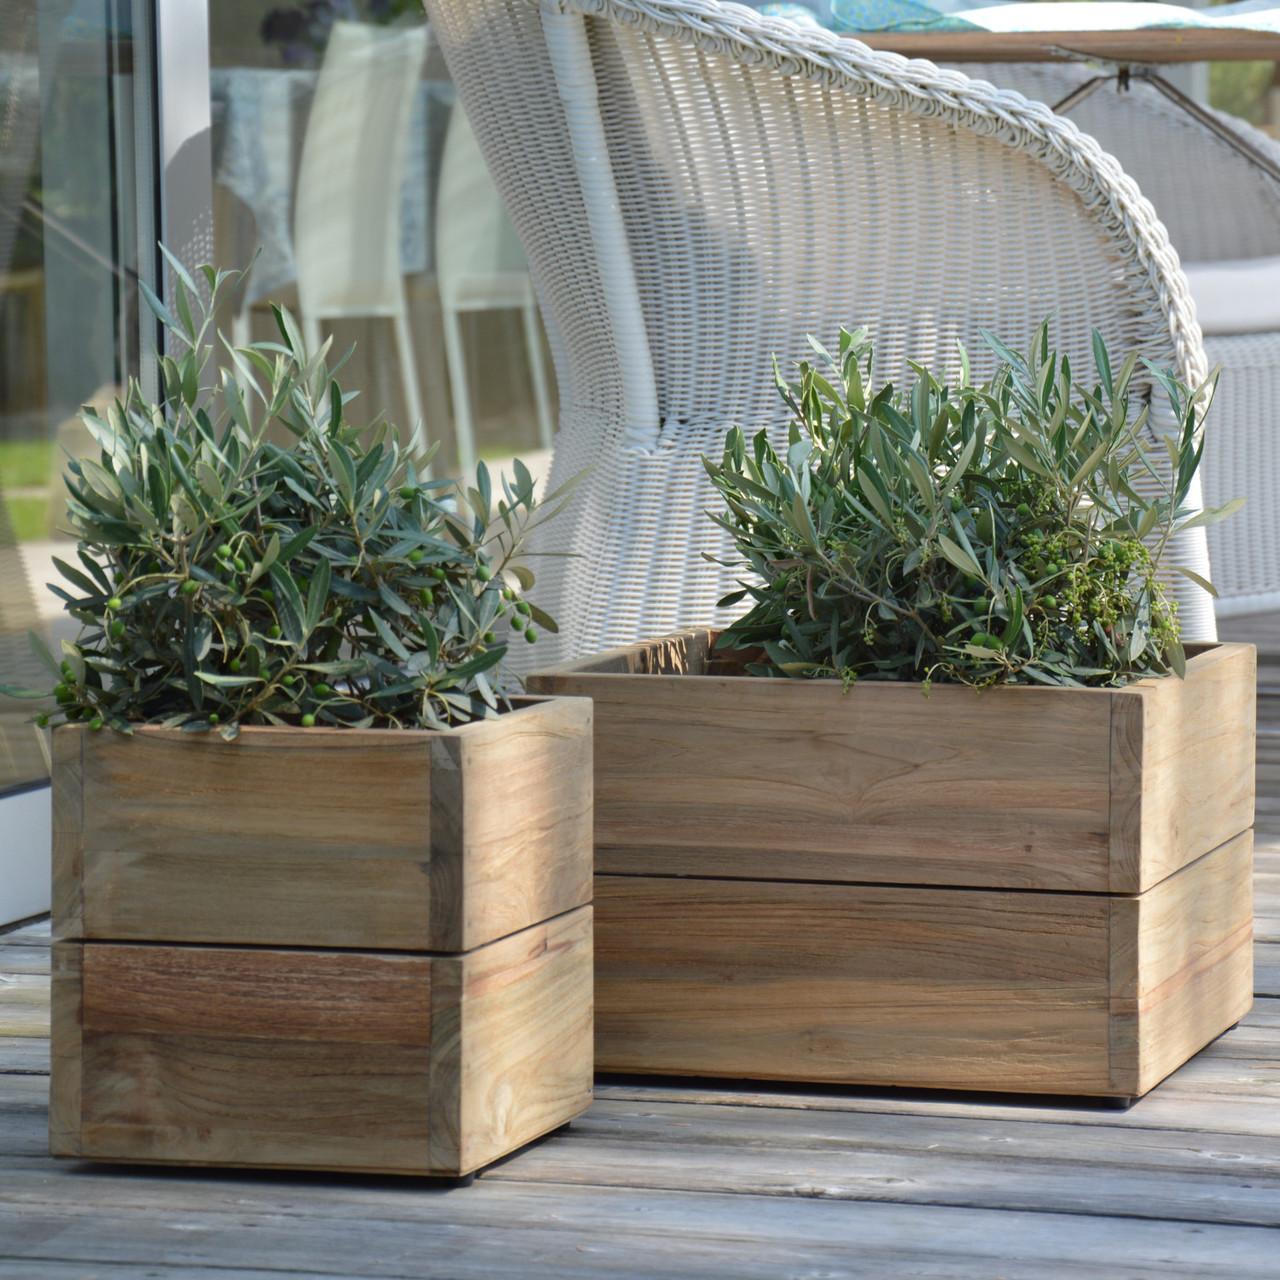 Blumentopf Mini Garden Container Jan Kurtz